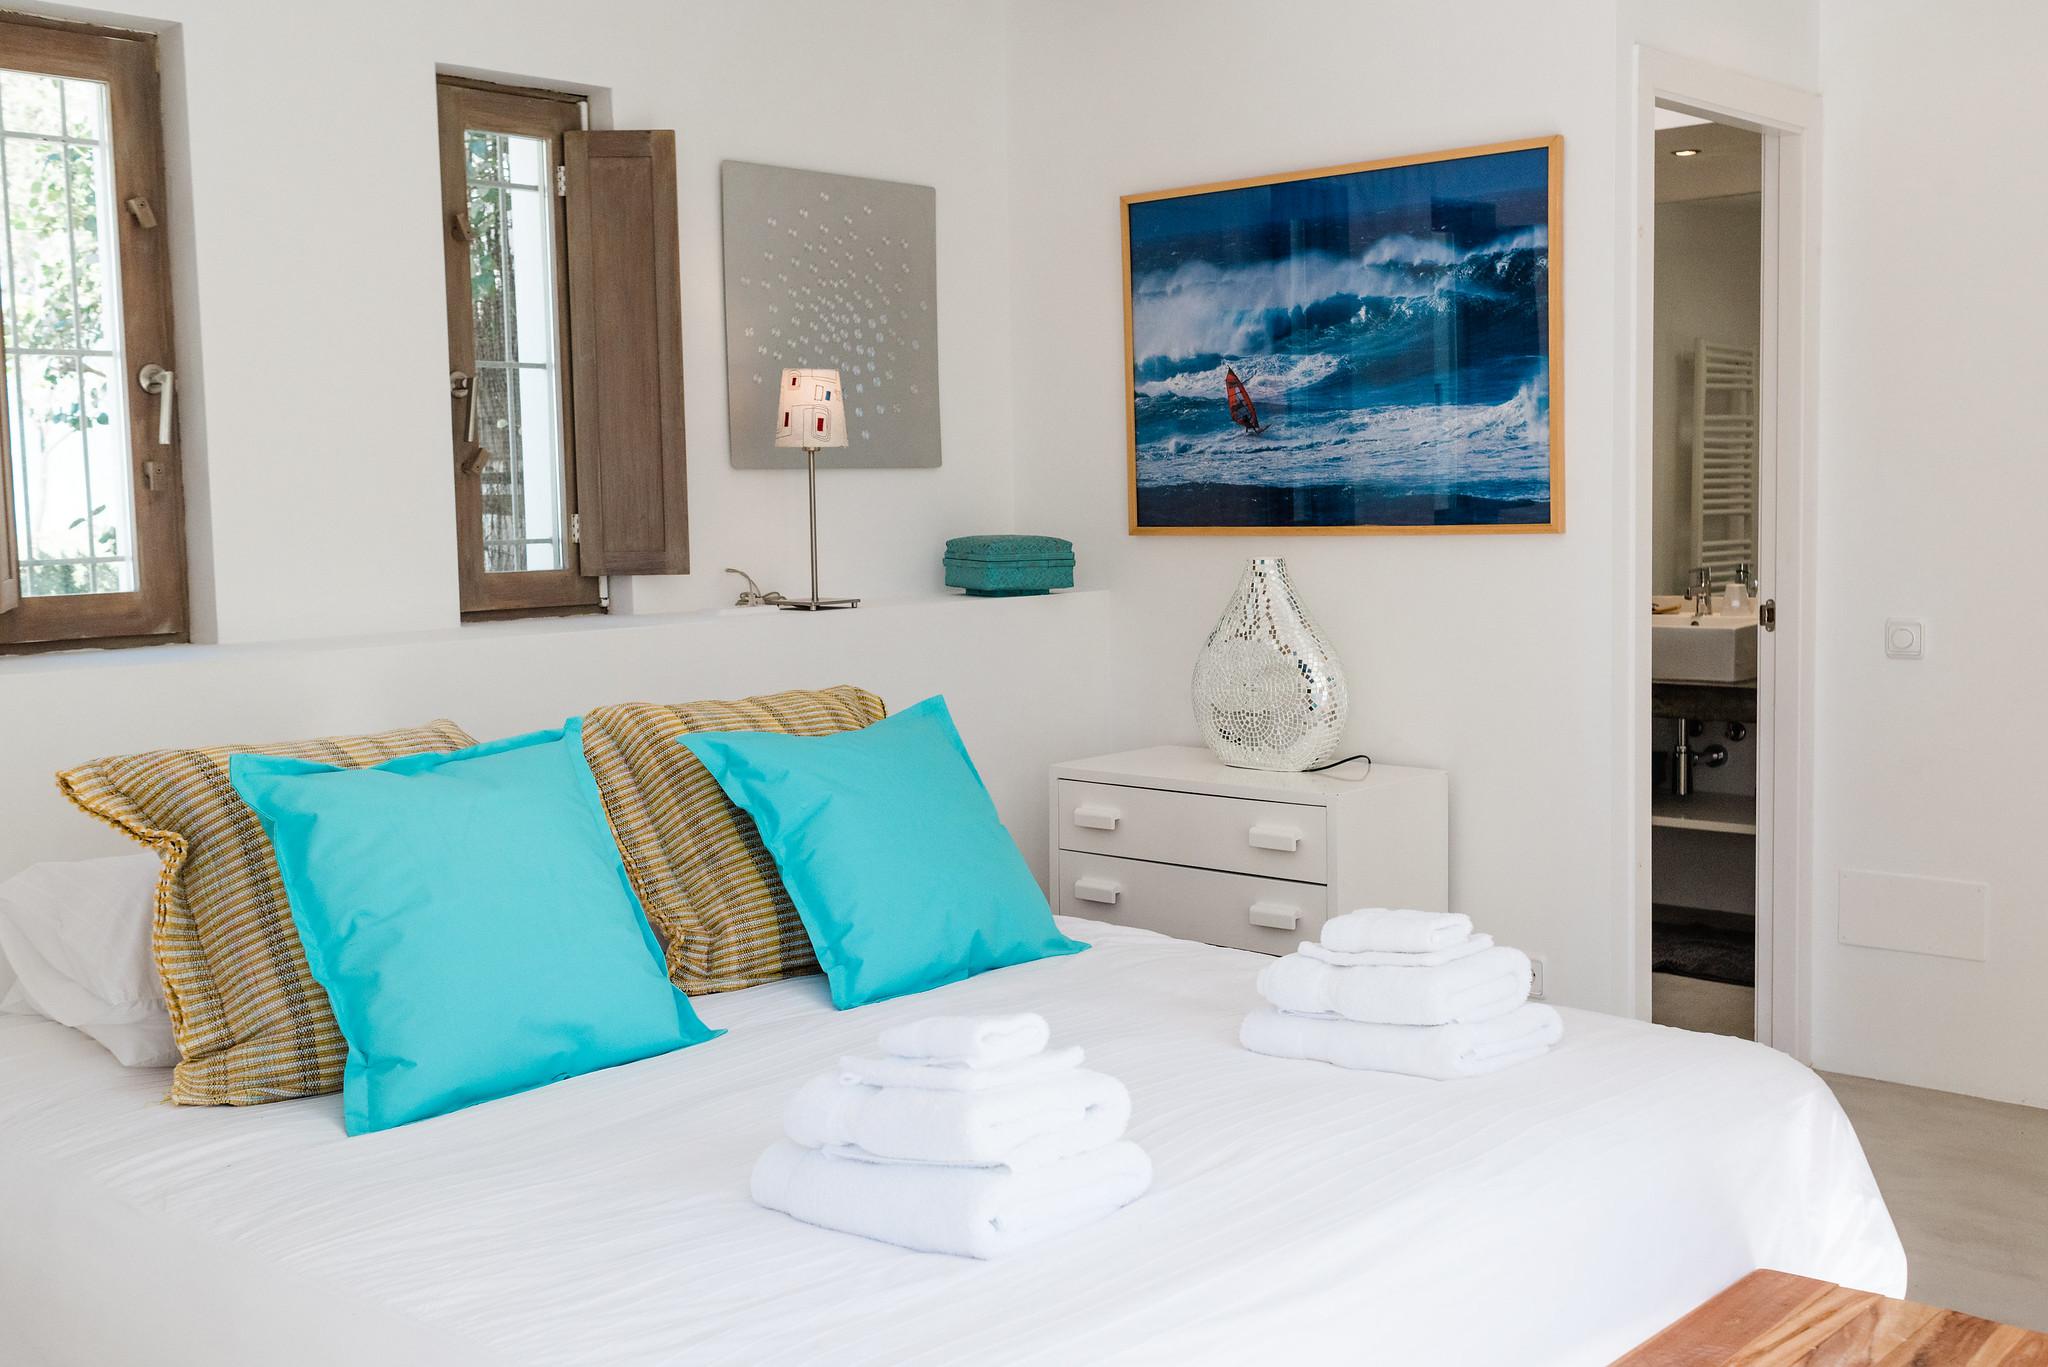 https://www.white-ibiza.com/wp-content/uploads/2020/06/white-ibiza-villas-casa-nyah-interior-bedroom9.jpg